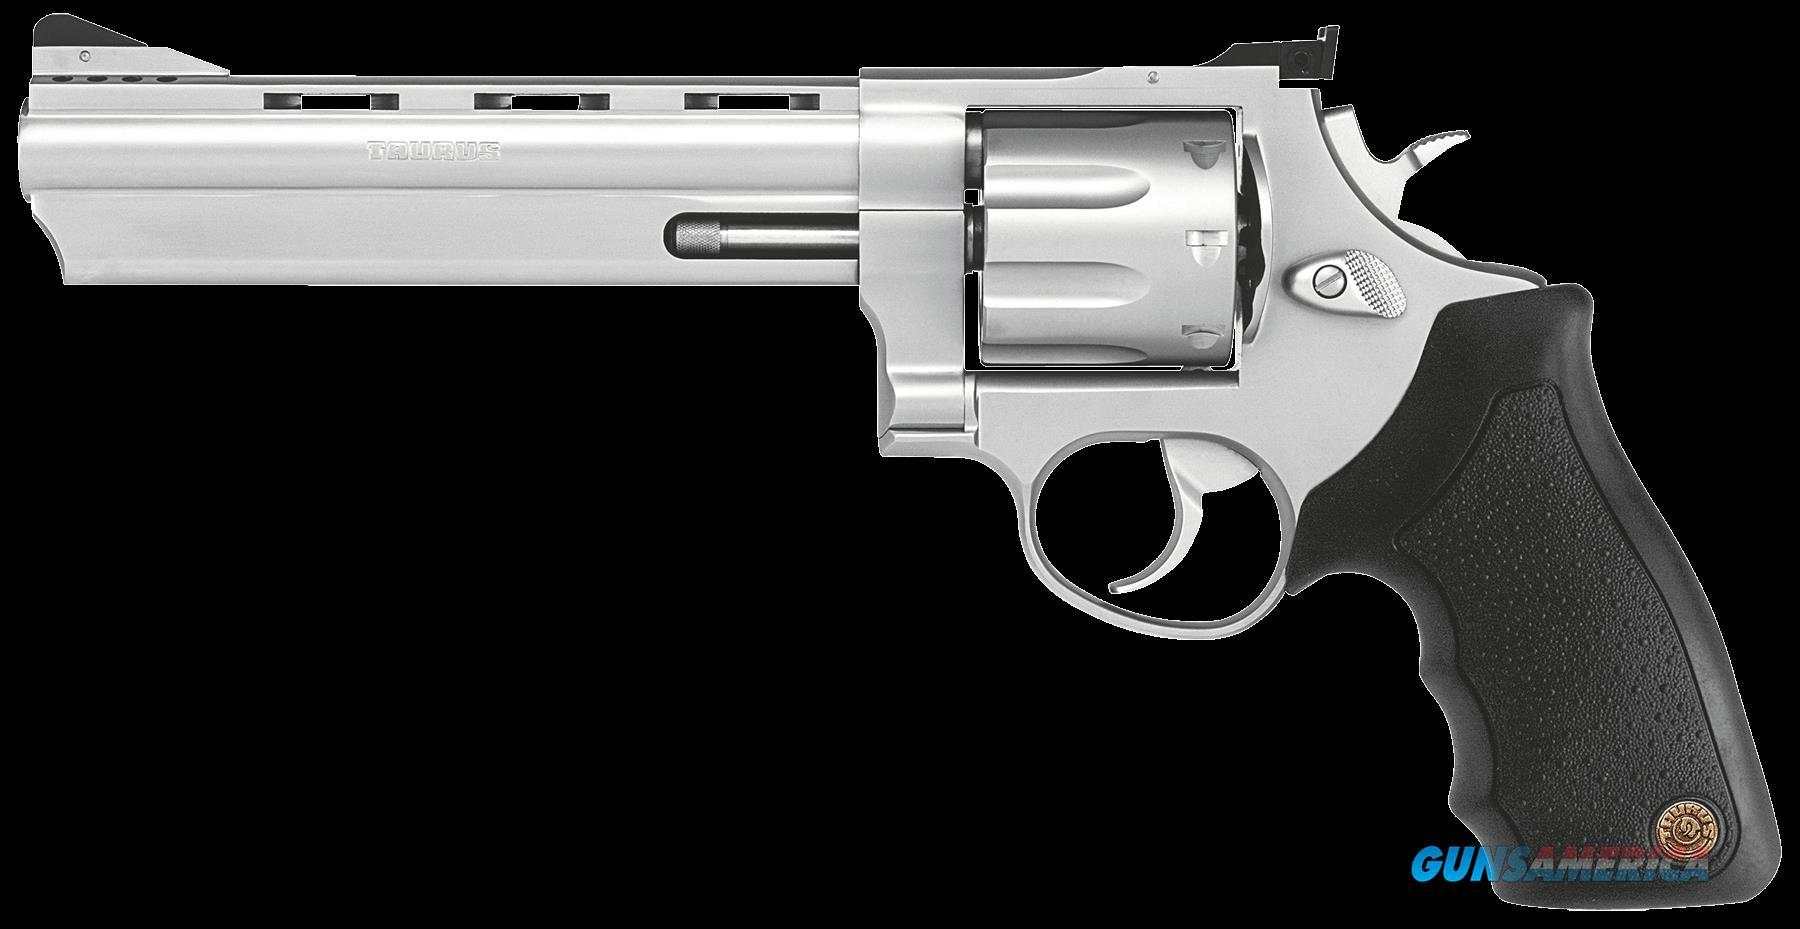 Taurus 608, Tau 2608069       608 357 6in As Pt             Ss  Guns > Pistols > 1911 Pistol Copies (non-Colt)